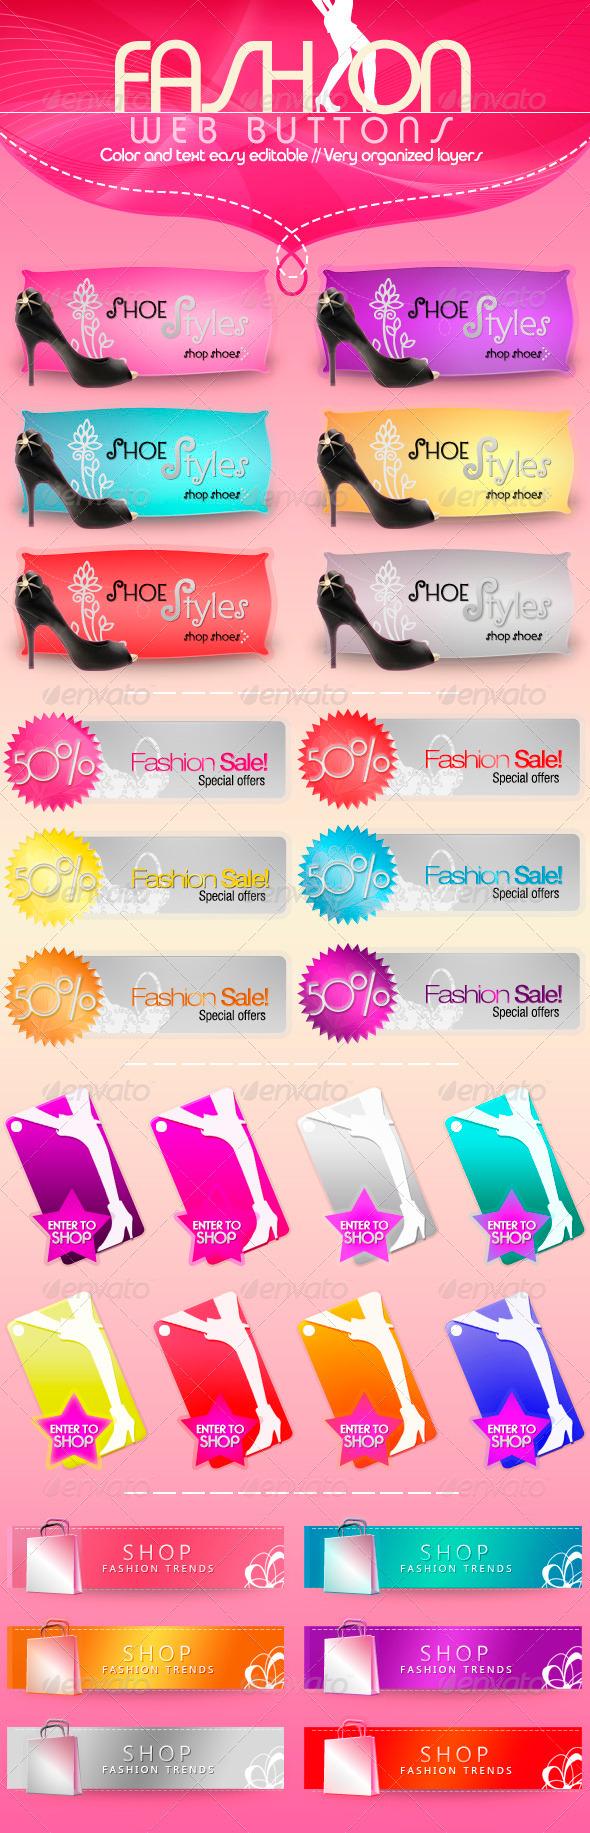 Fashion Web Buttons - Buttons Web Elements